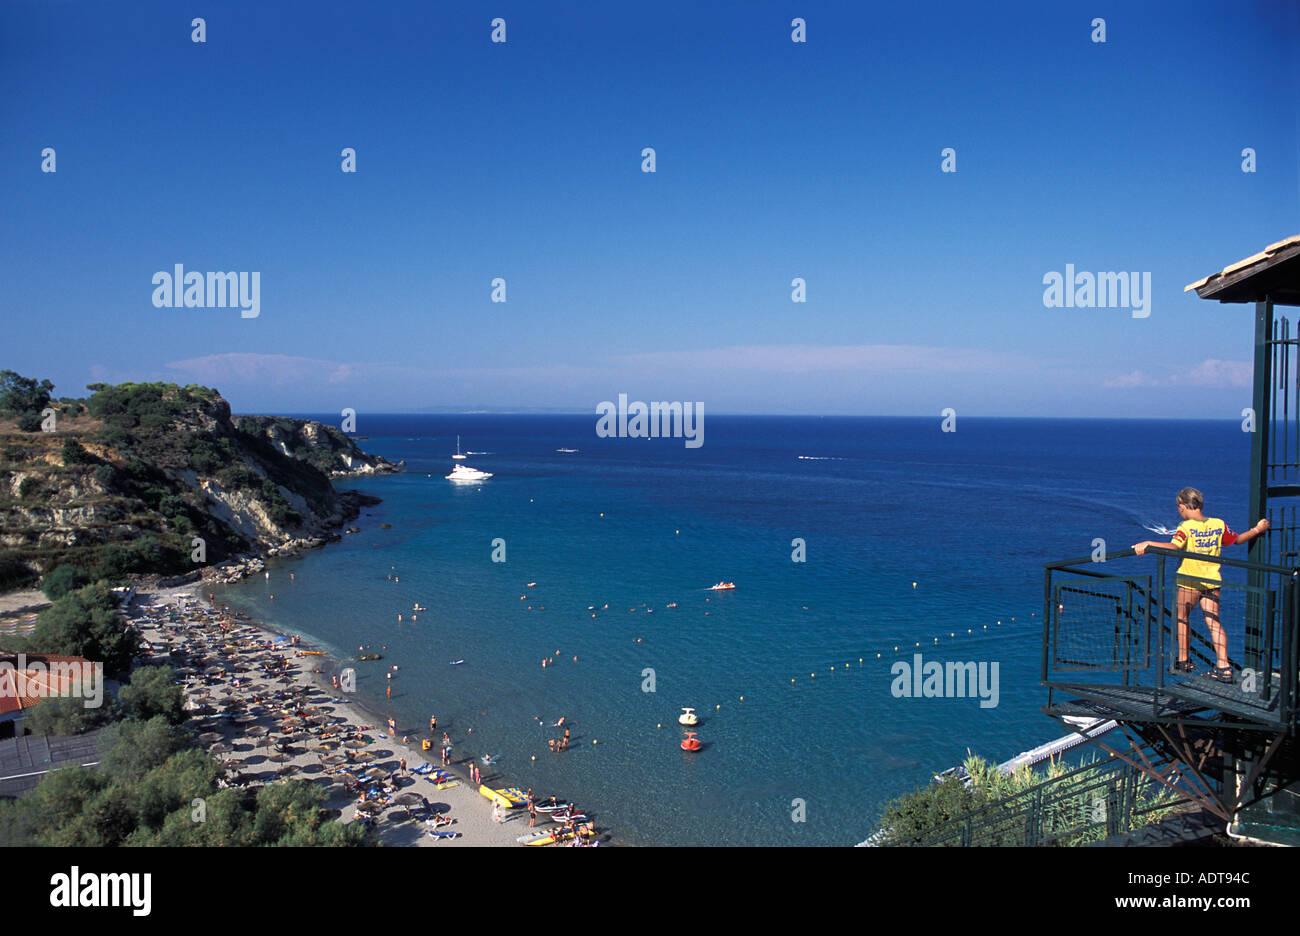 Popular beach Vasilikos Zakynthos island also known as Zante Ionian Islands Greece Mediterranean Sea - Stock Image